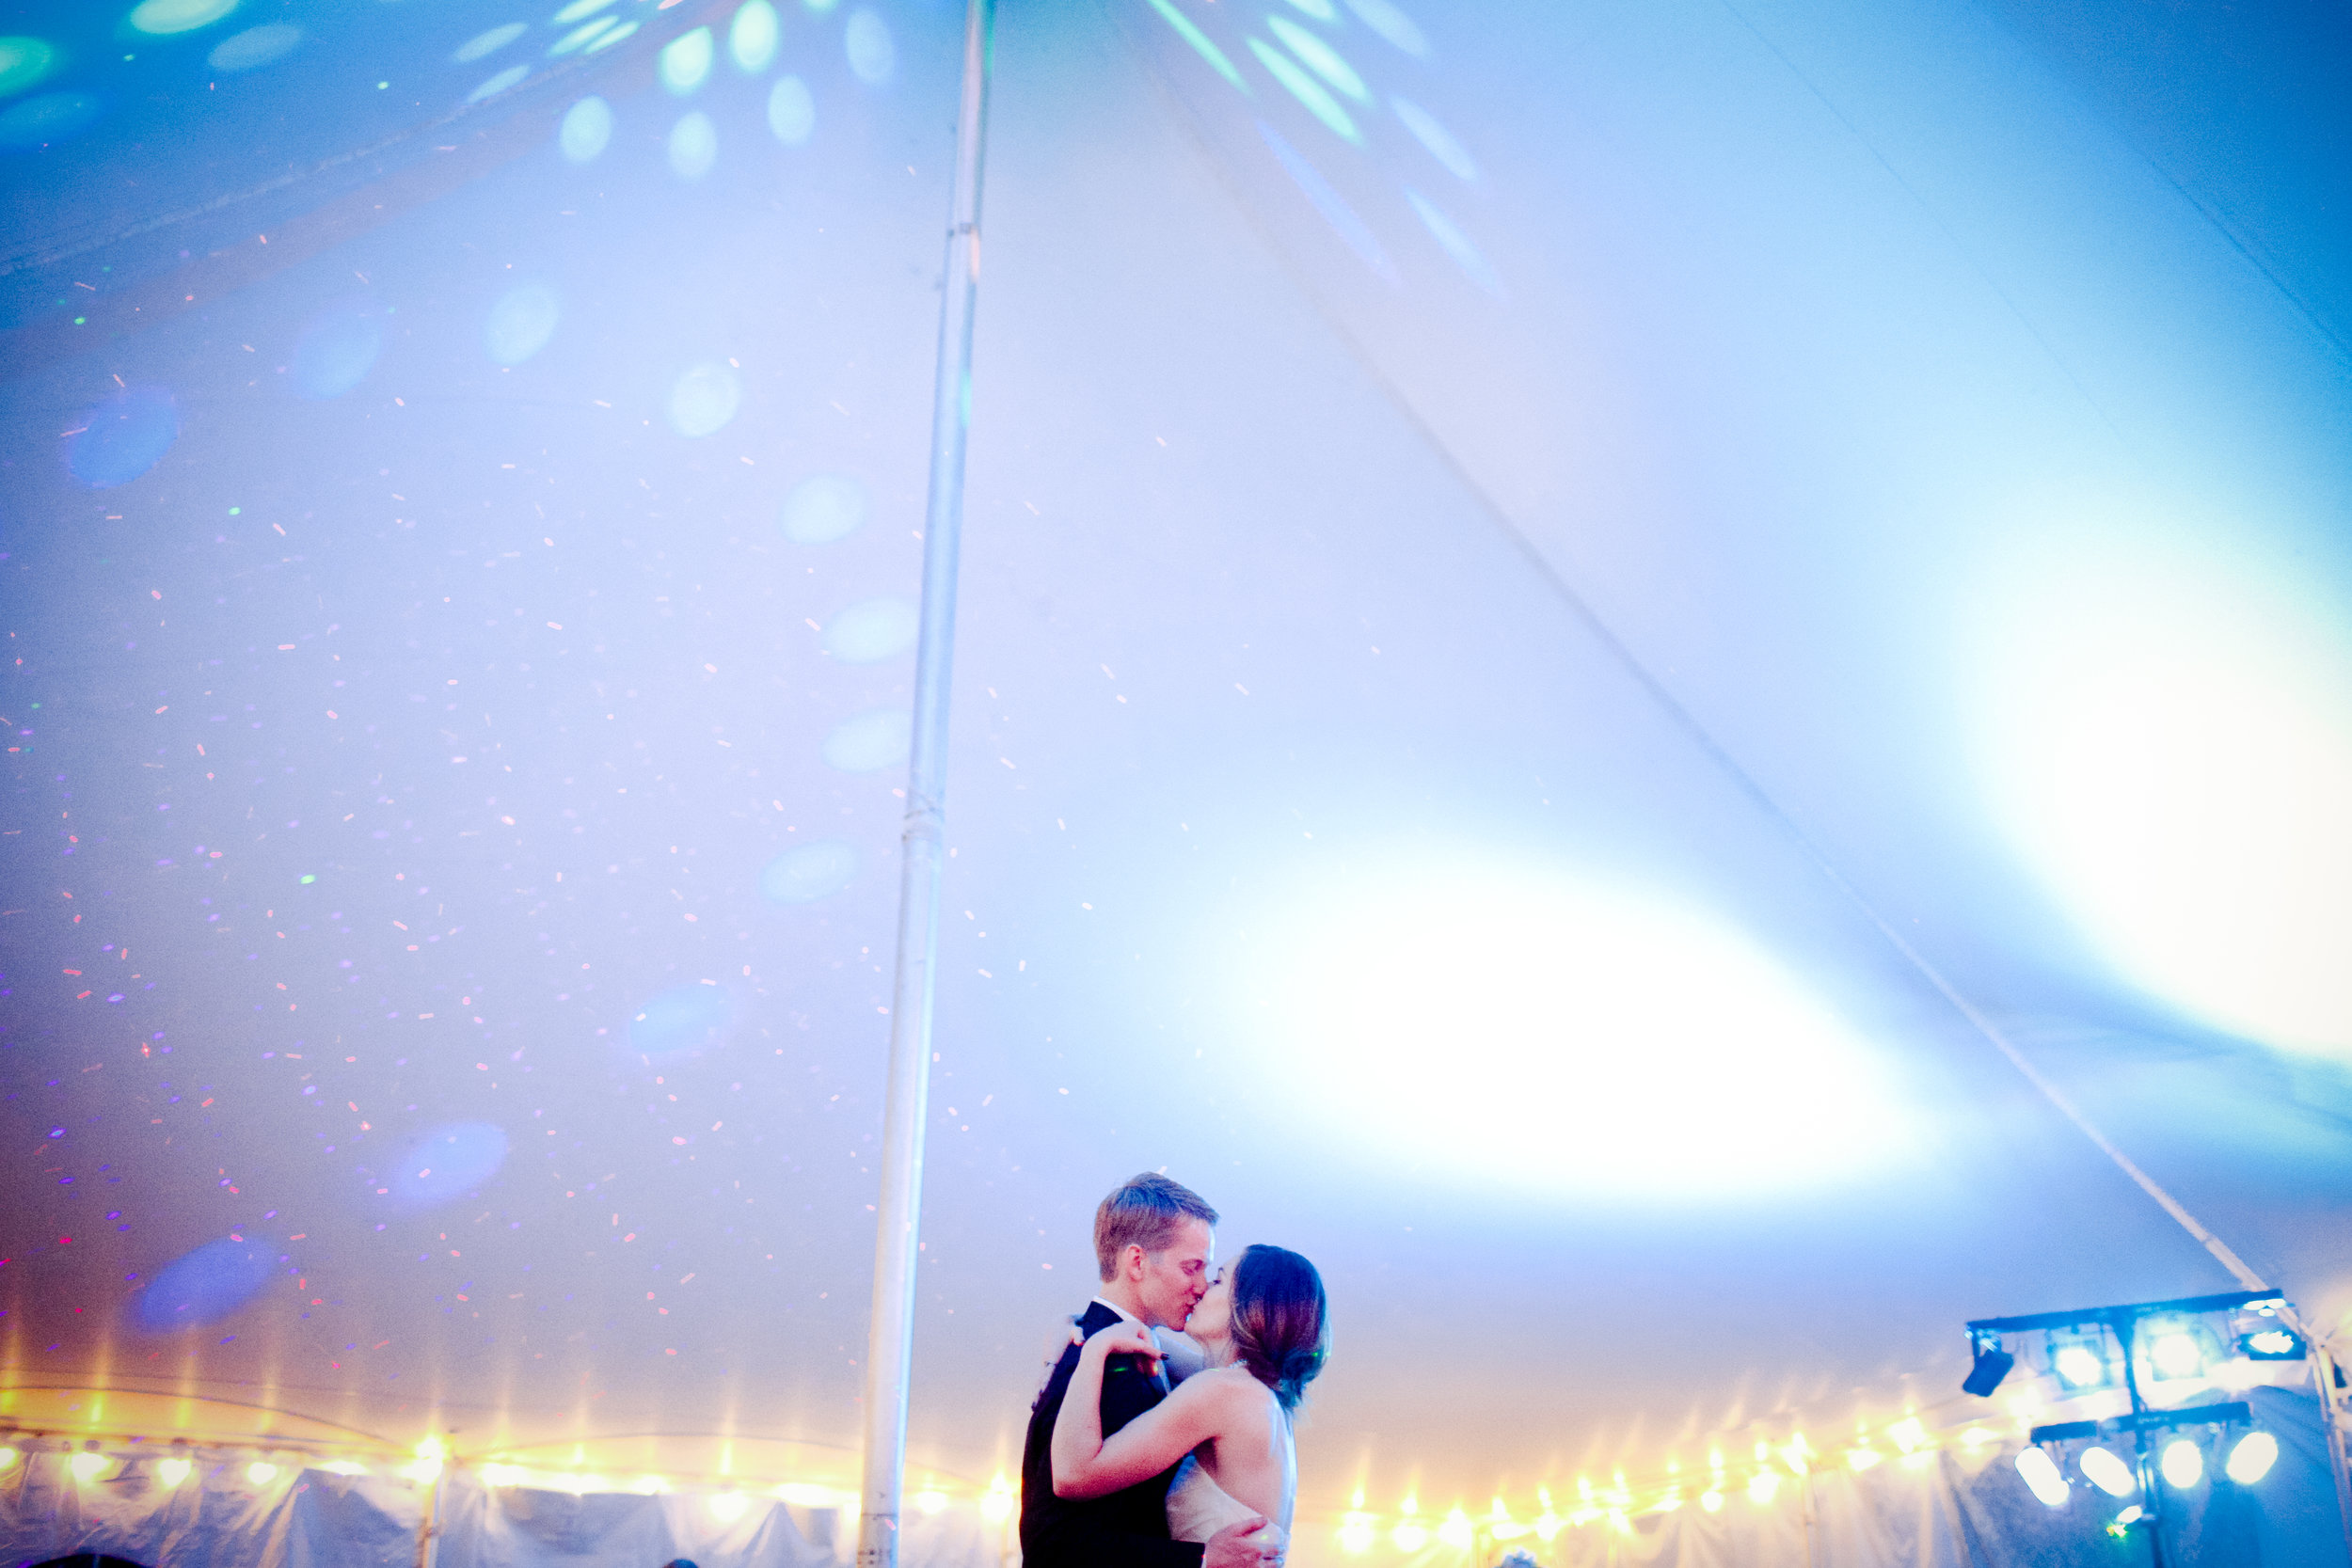 0025_100712 190 metcalf wedding edited.JPG